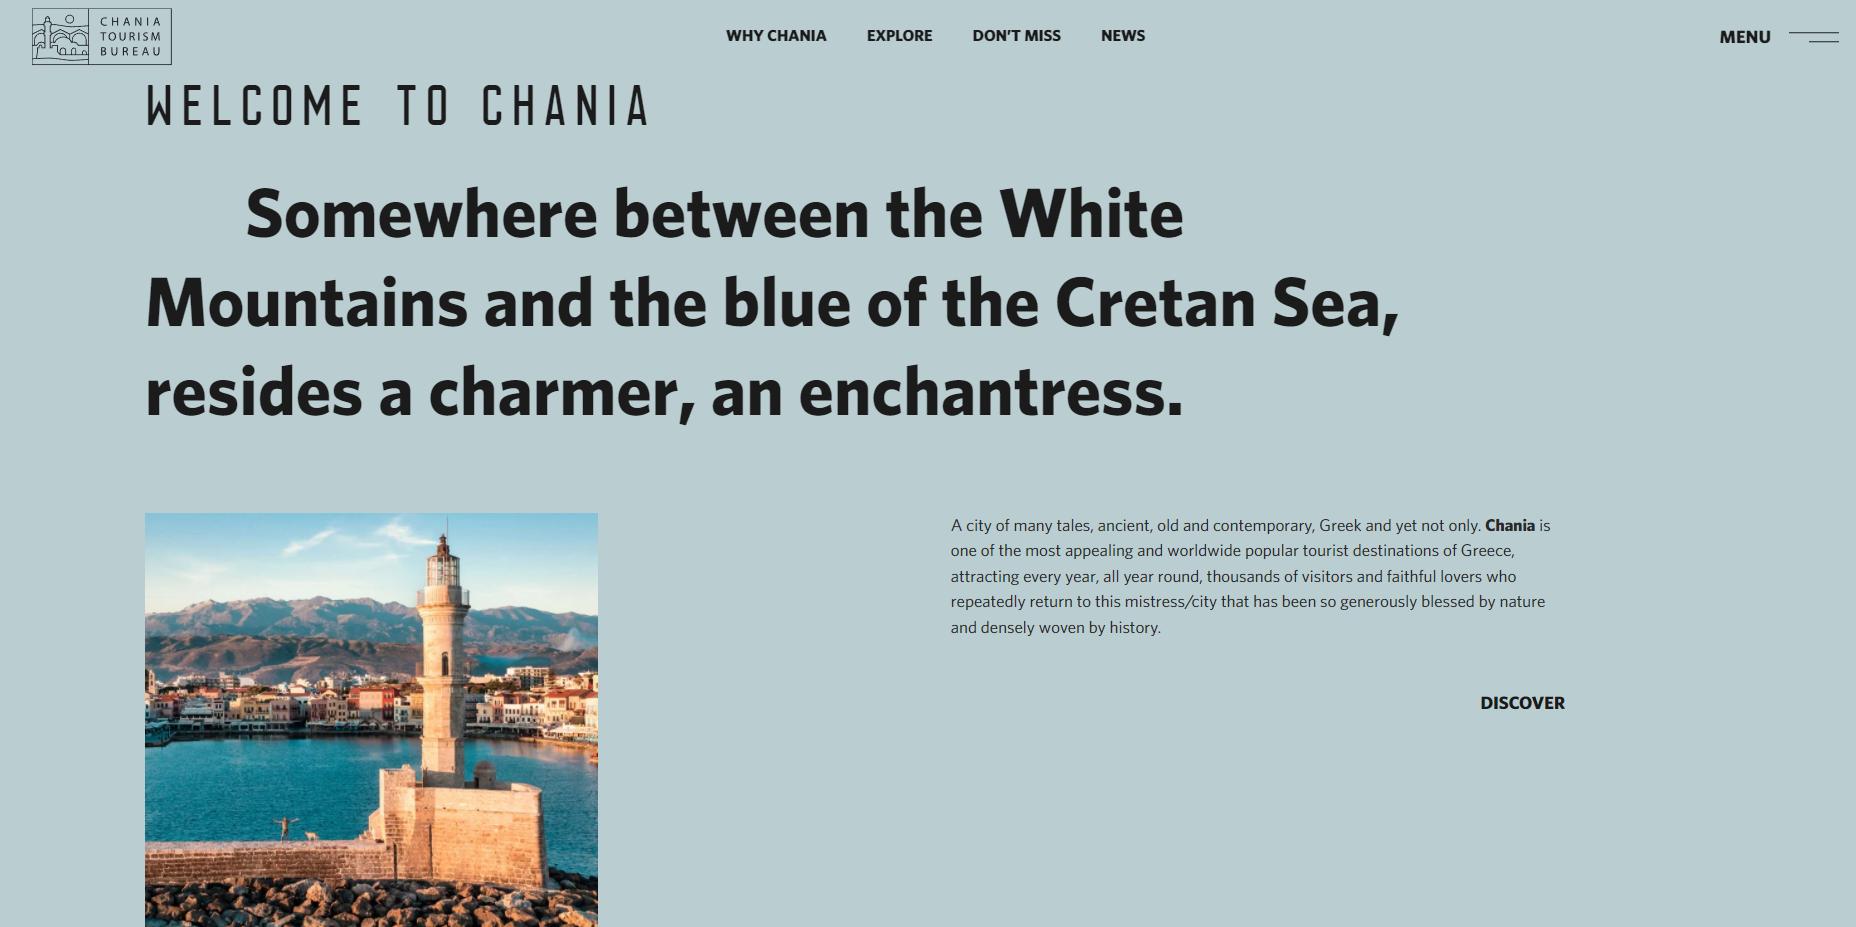 https://www.chania.gr/files/55/44537/chania_tourism1.png